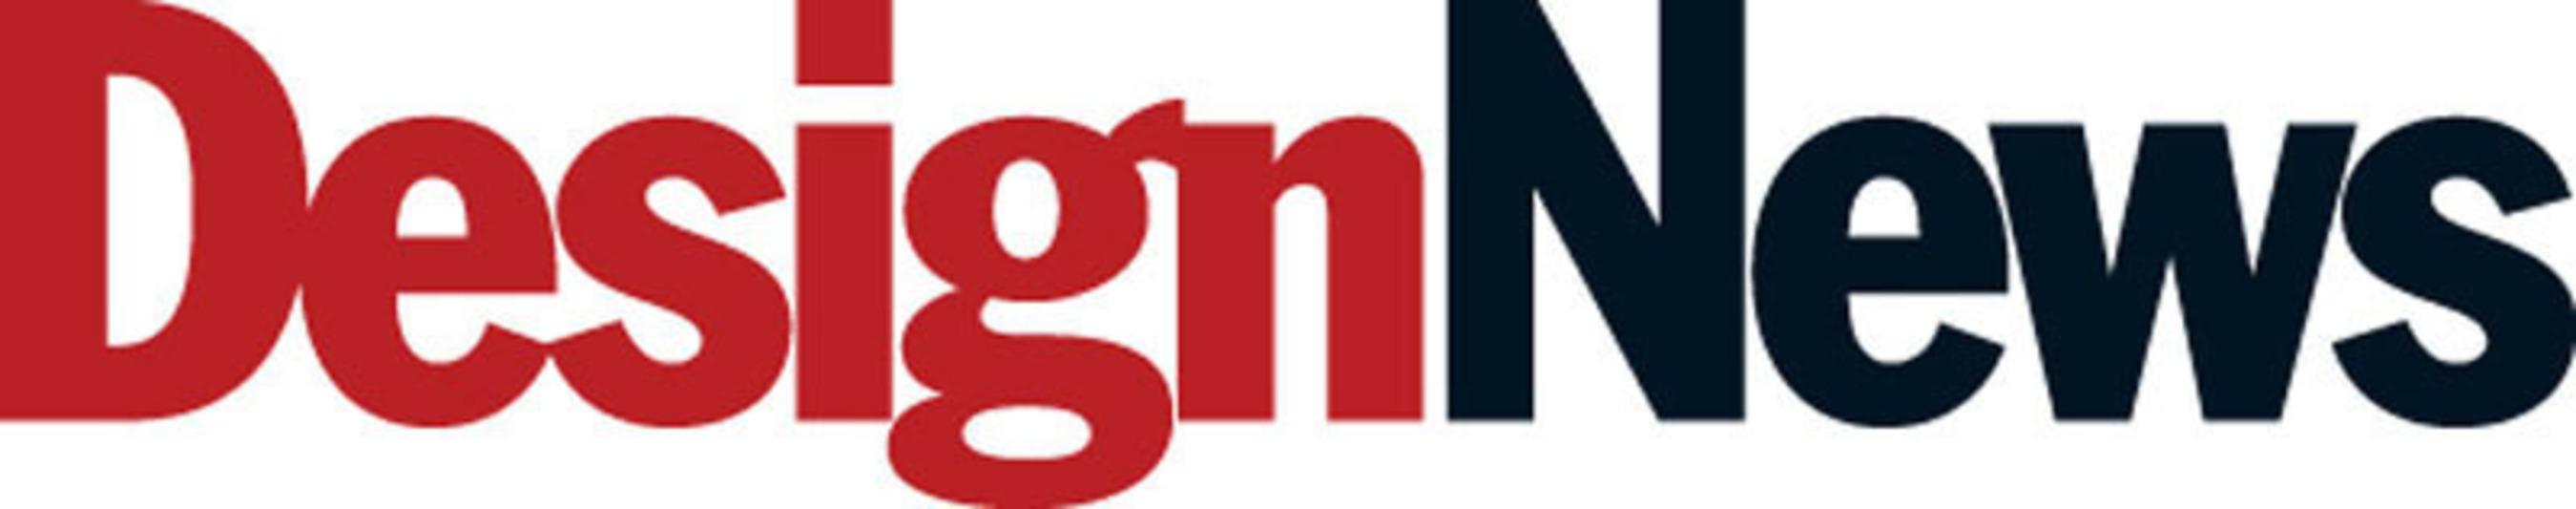 Design News. (PRNewsFoto/UBM Canon) (PRNewsFoto/UBM CANON)